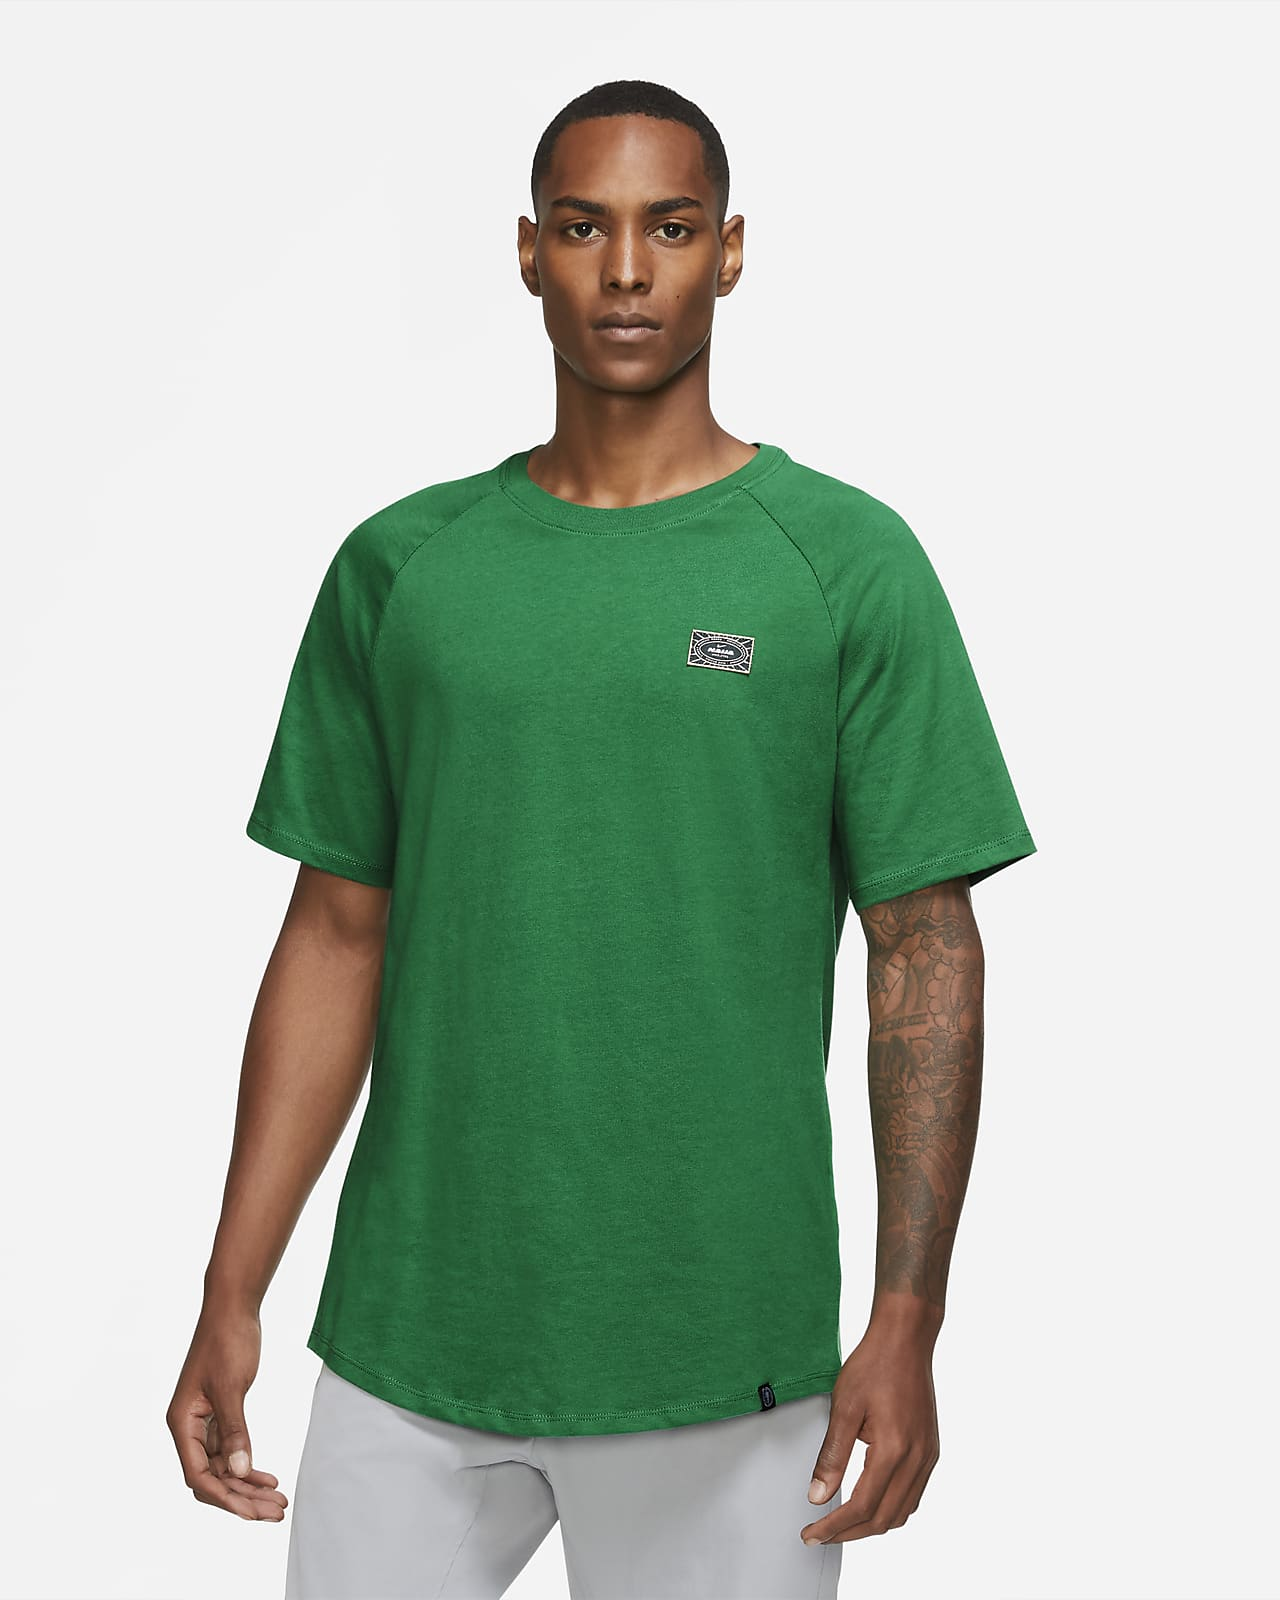 Nigeria Men's Football T-Shirt